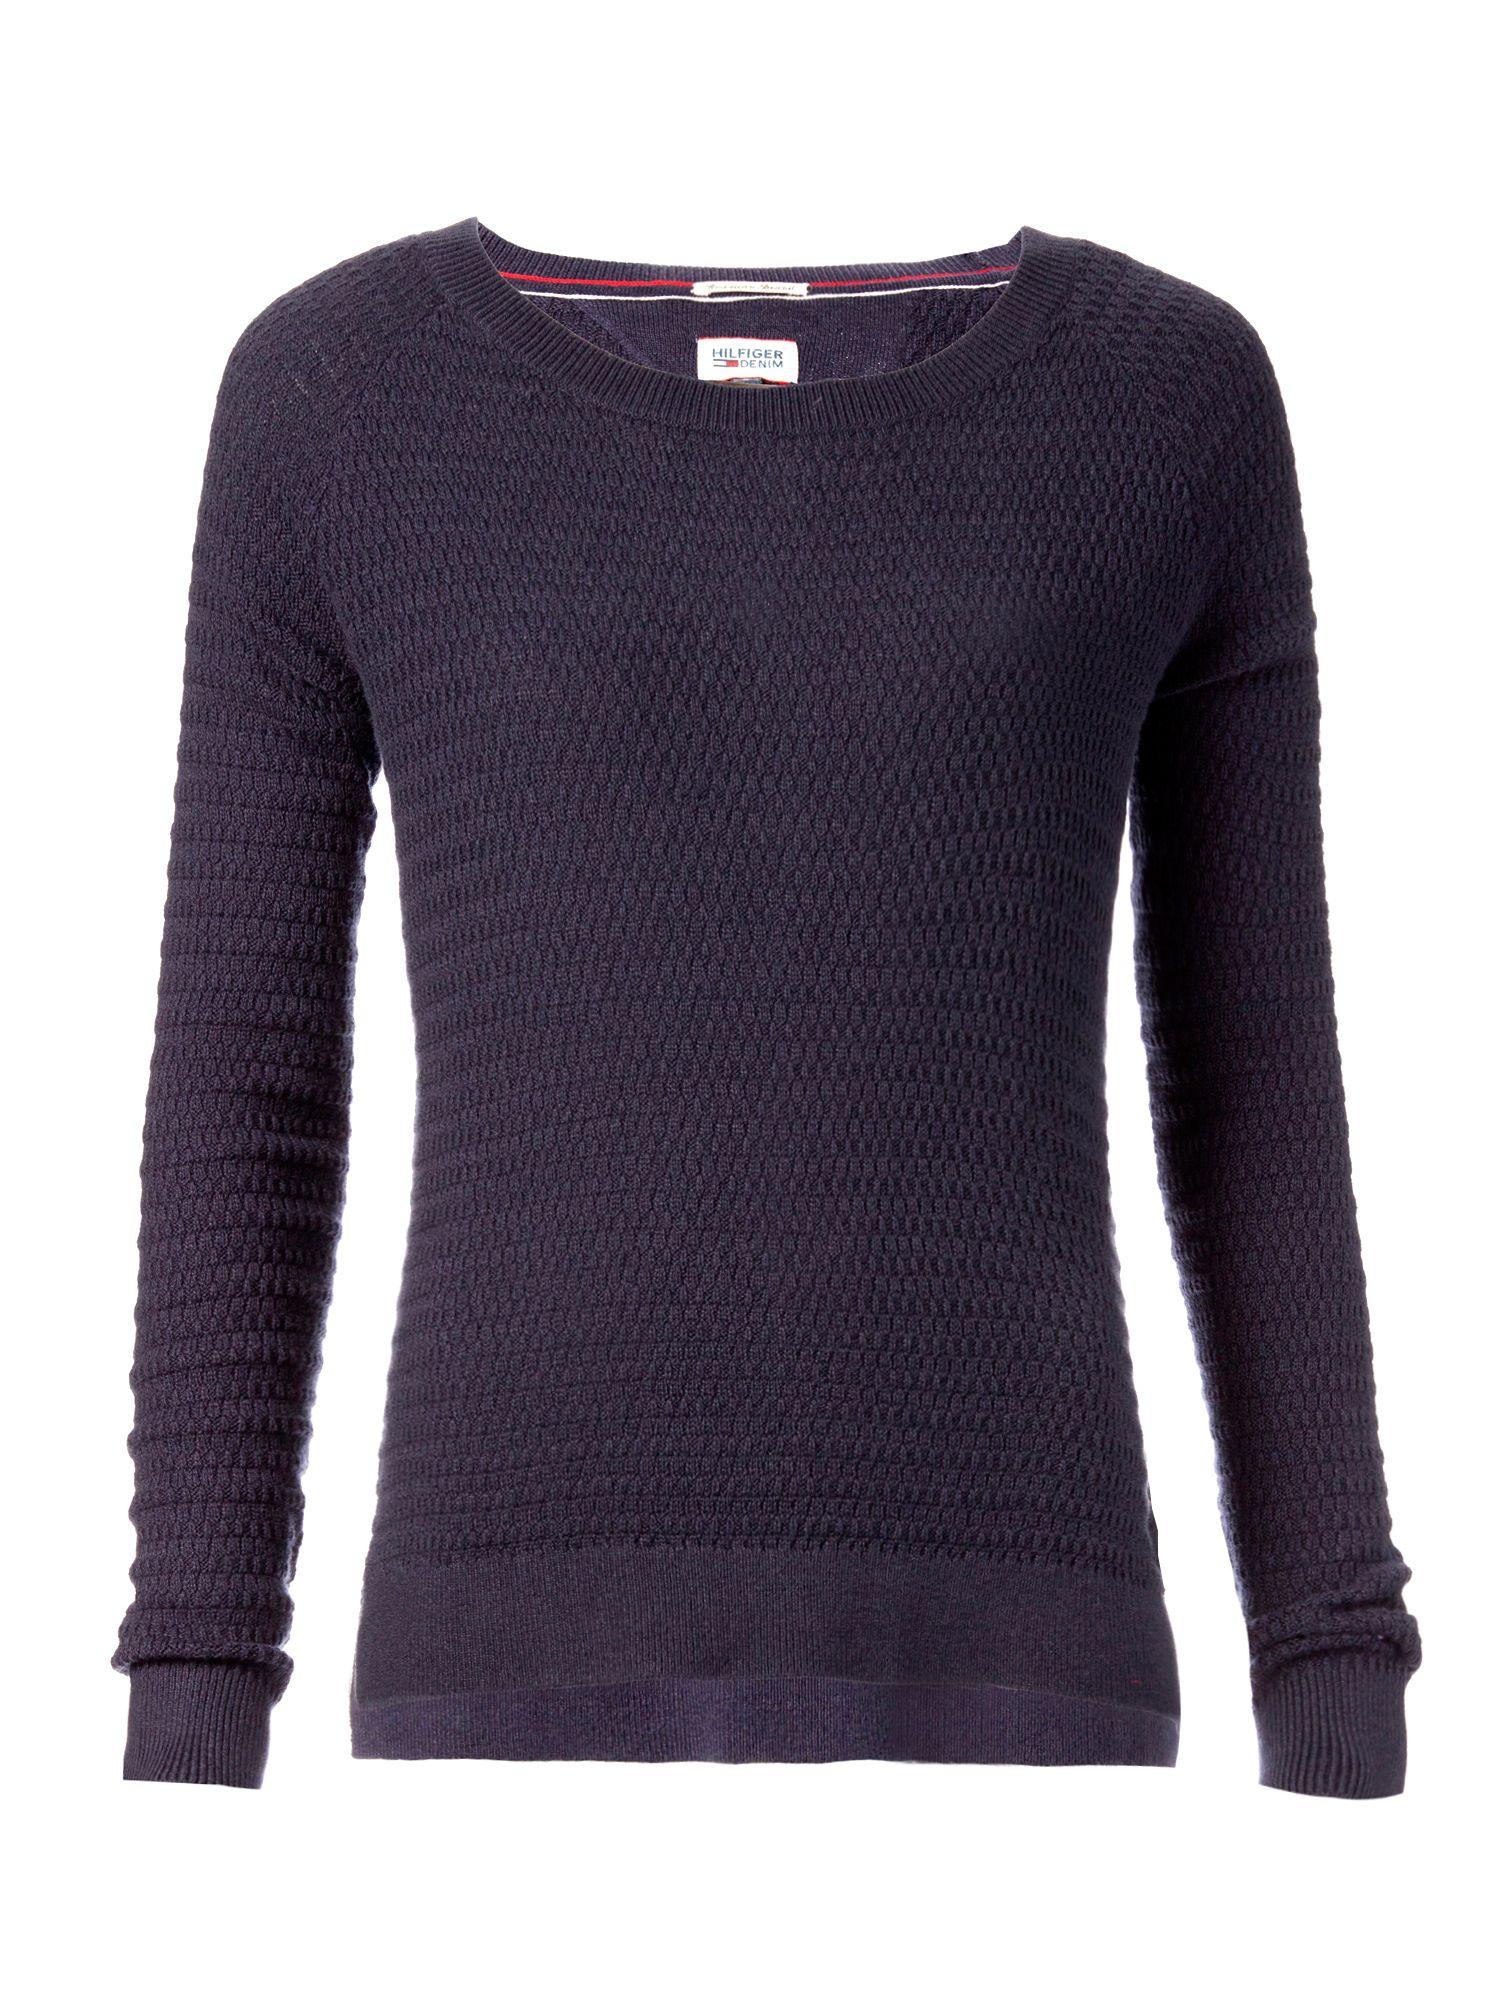 tommy hilfiger sada sweater in purple blue lyst. Black Bedroom Furniture Sets. Home Design Ideas